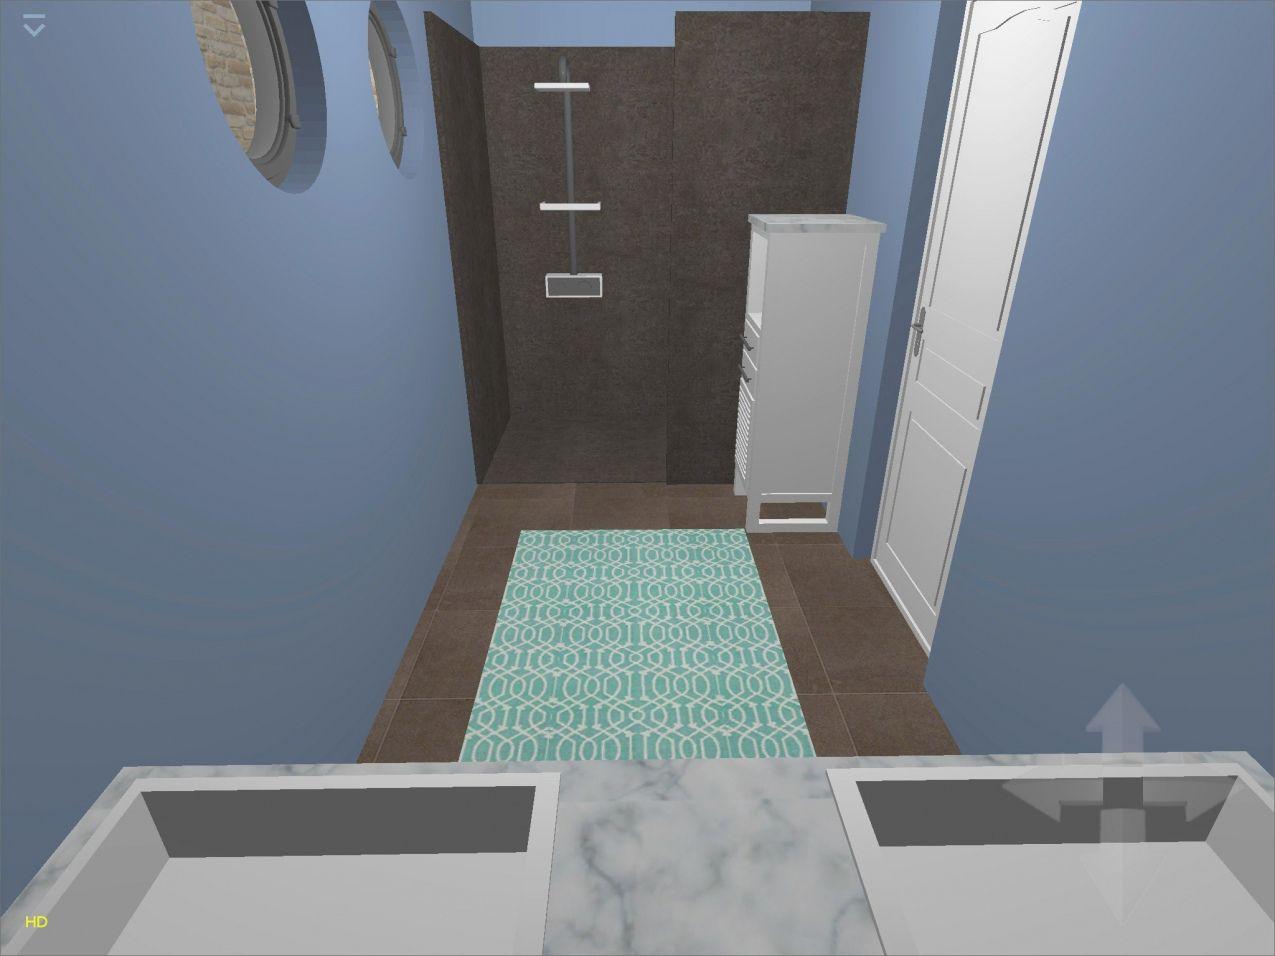 77 Panneau Mural Salle De Bain Leroy Merlin 2020 Tile Bathroom